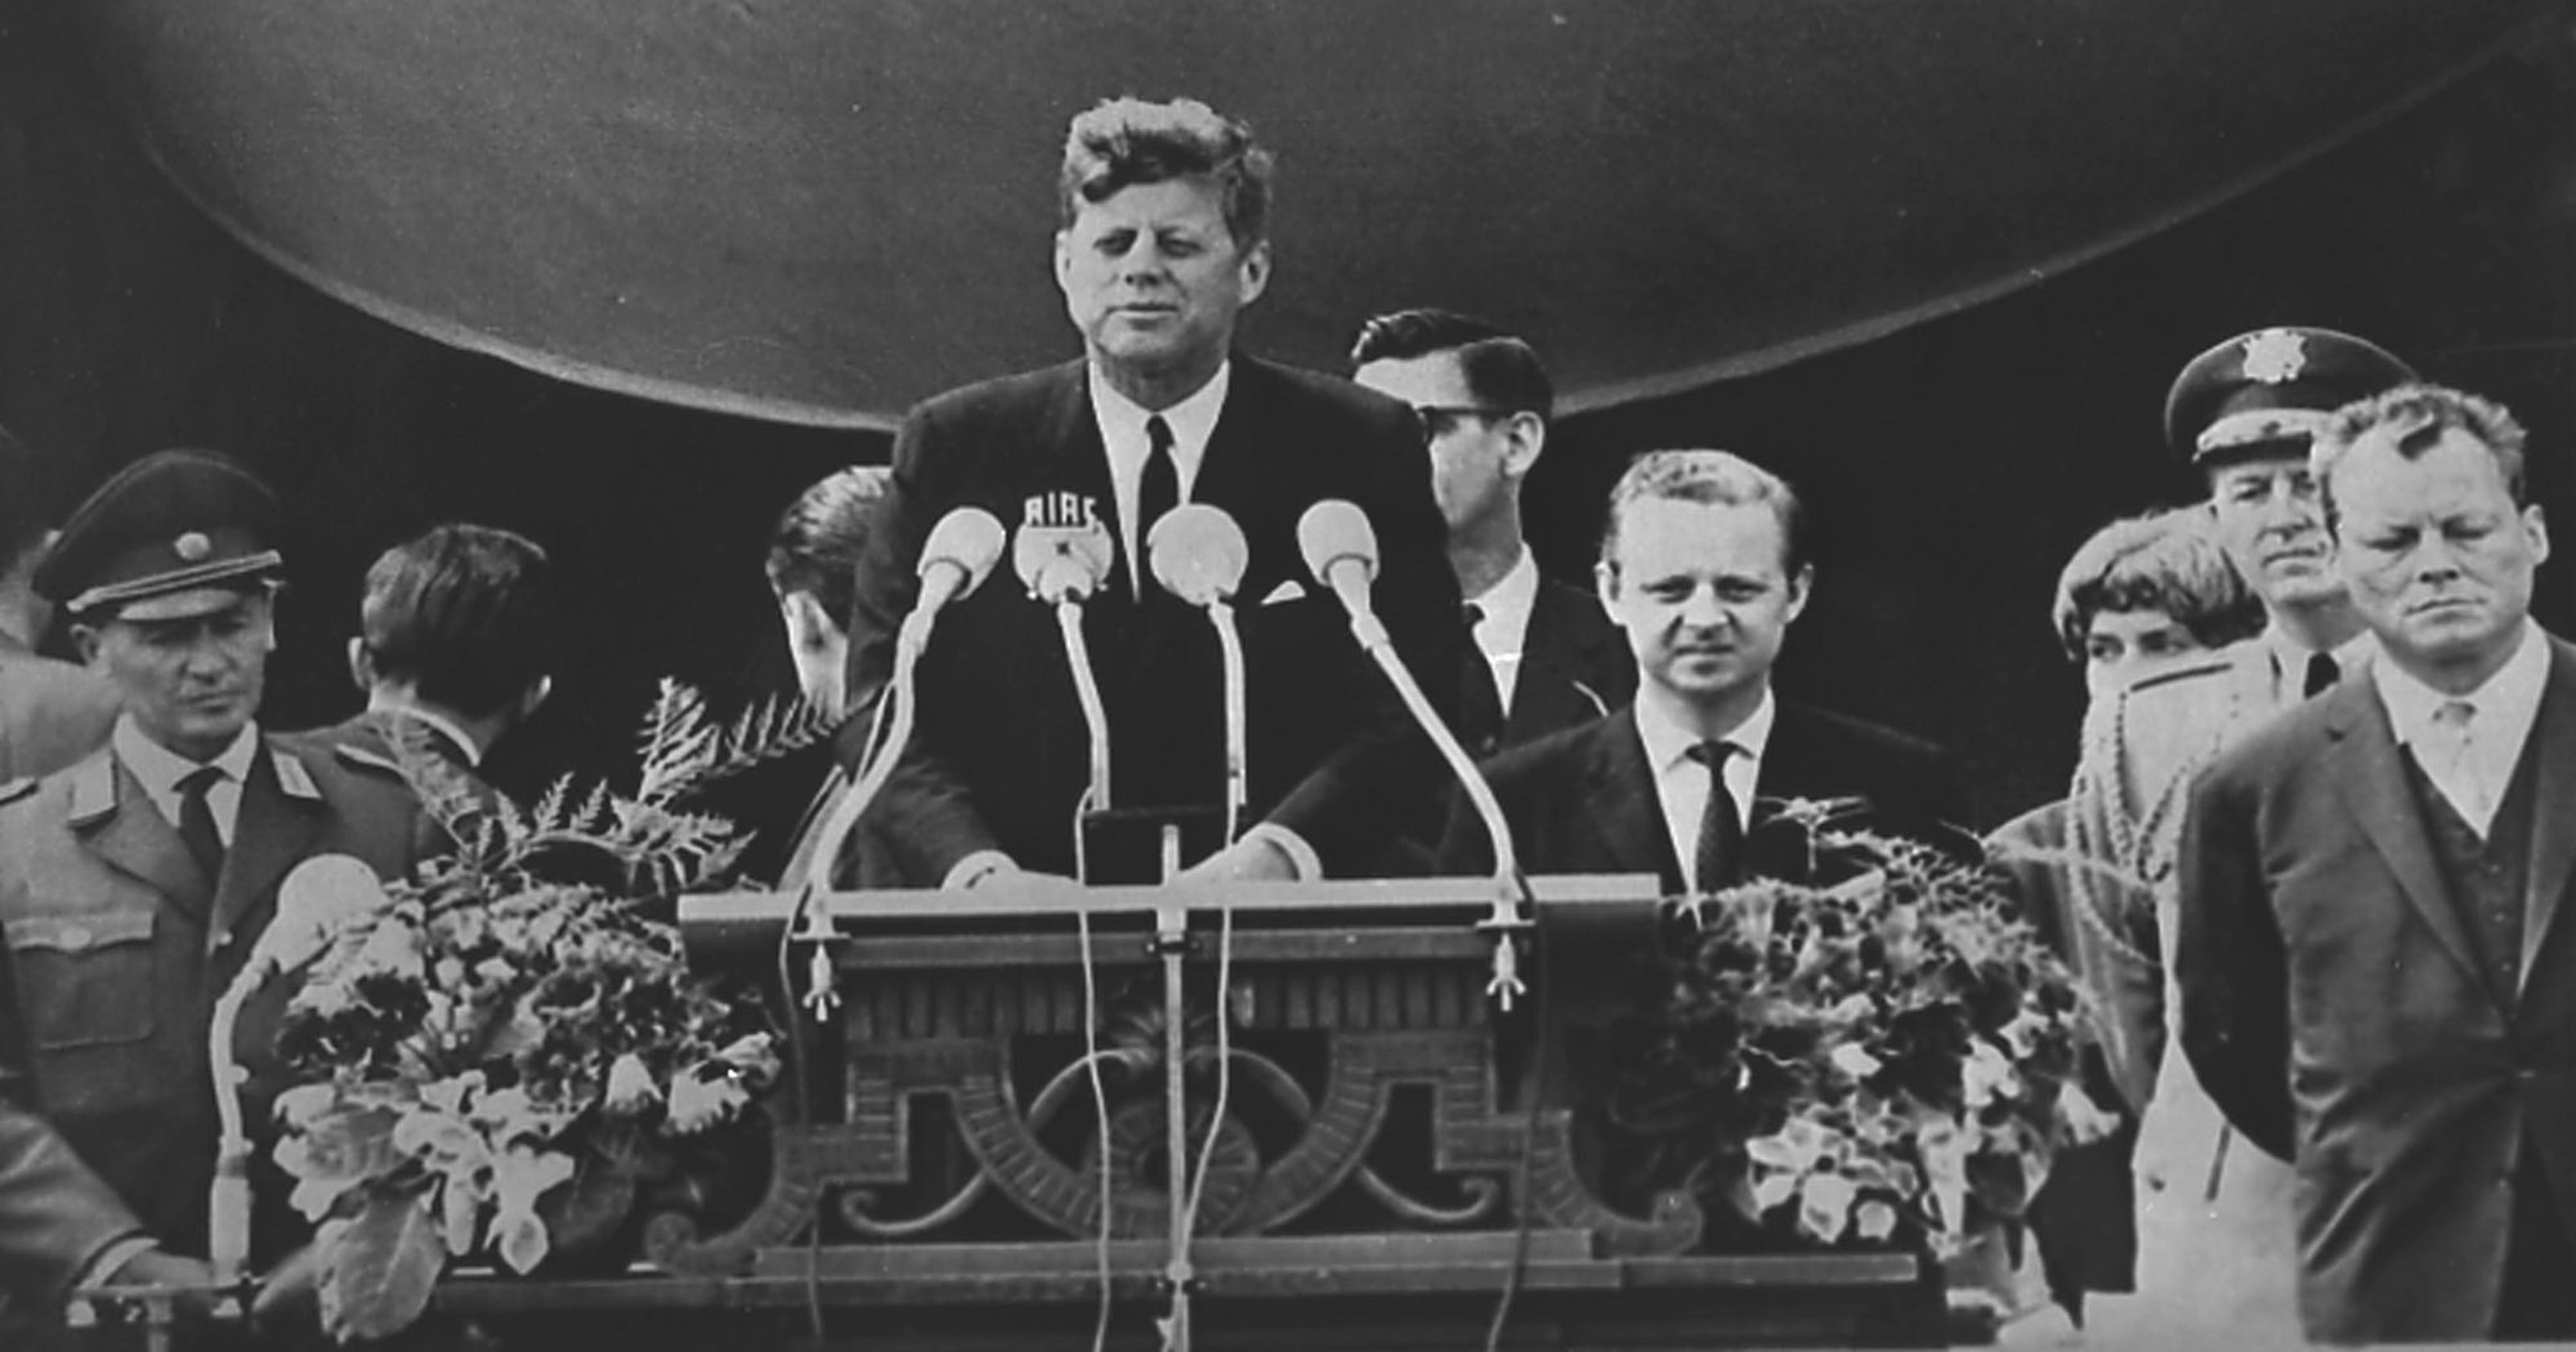 john kennedy inaugural address summary